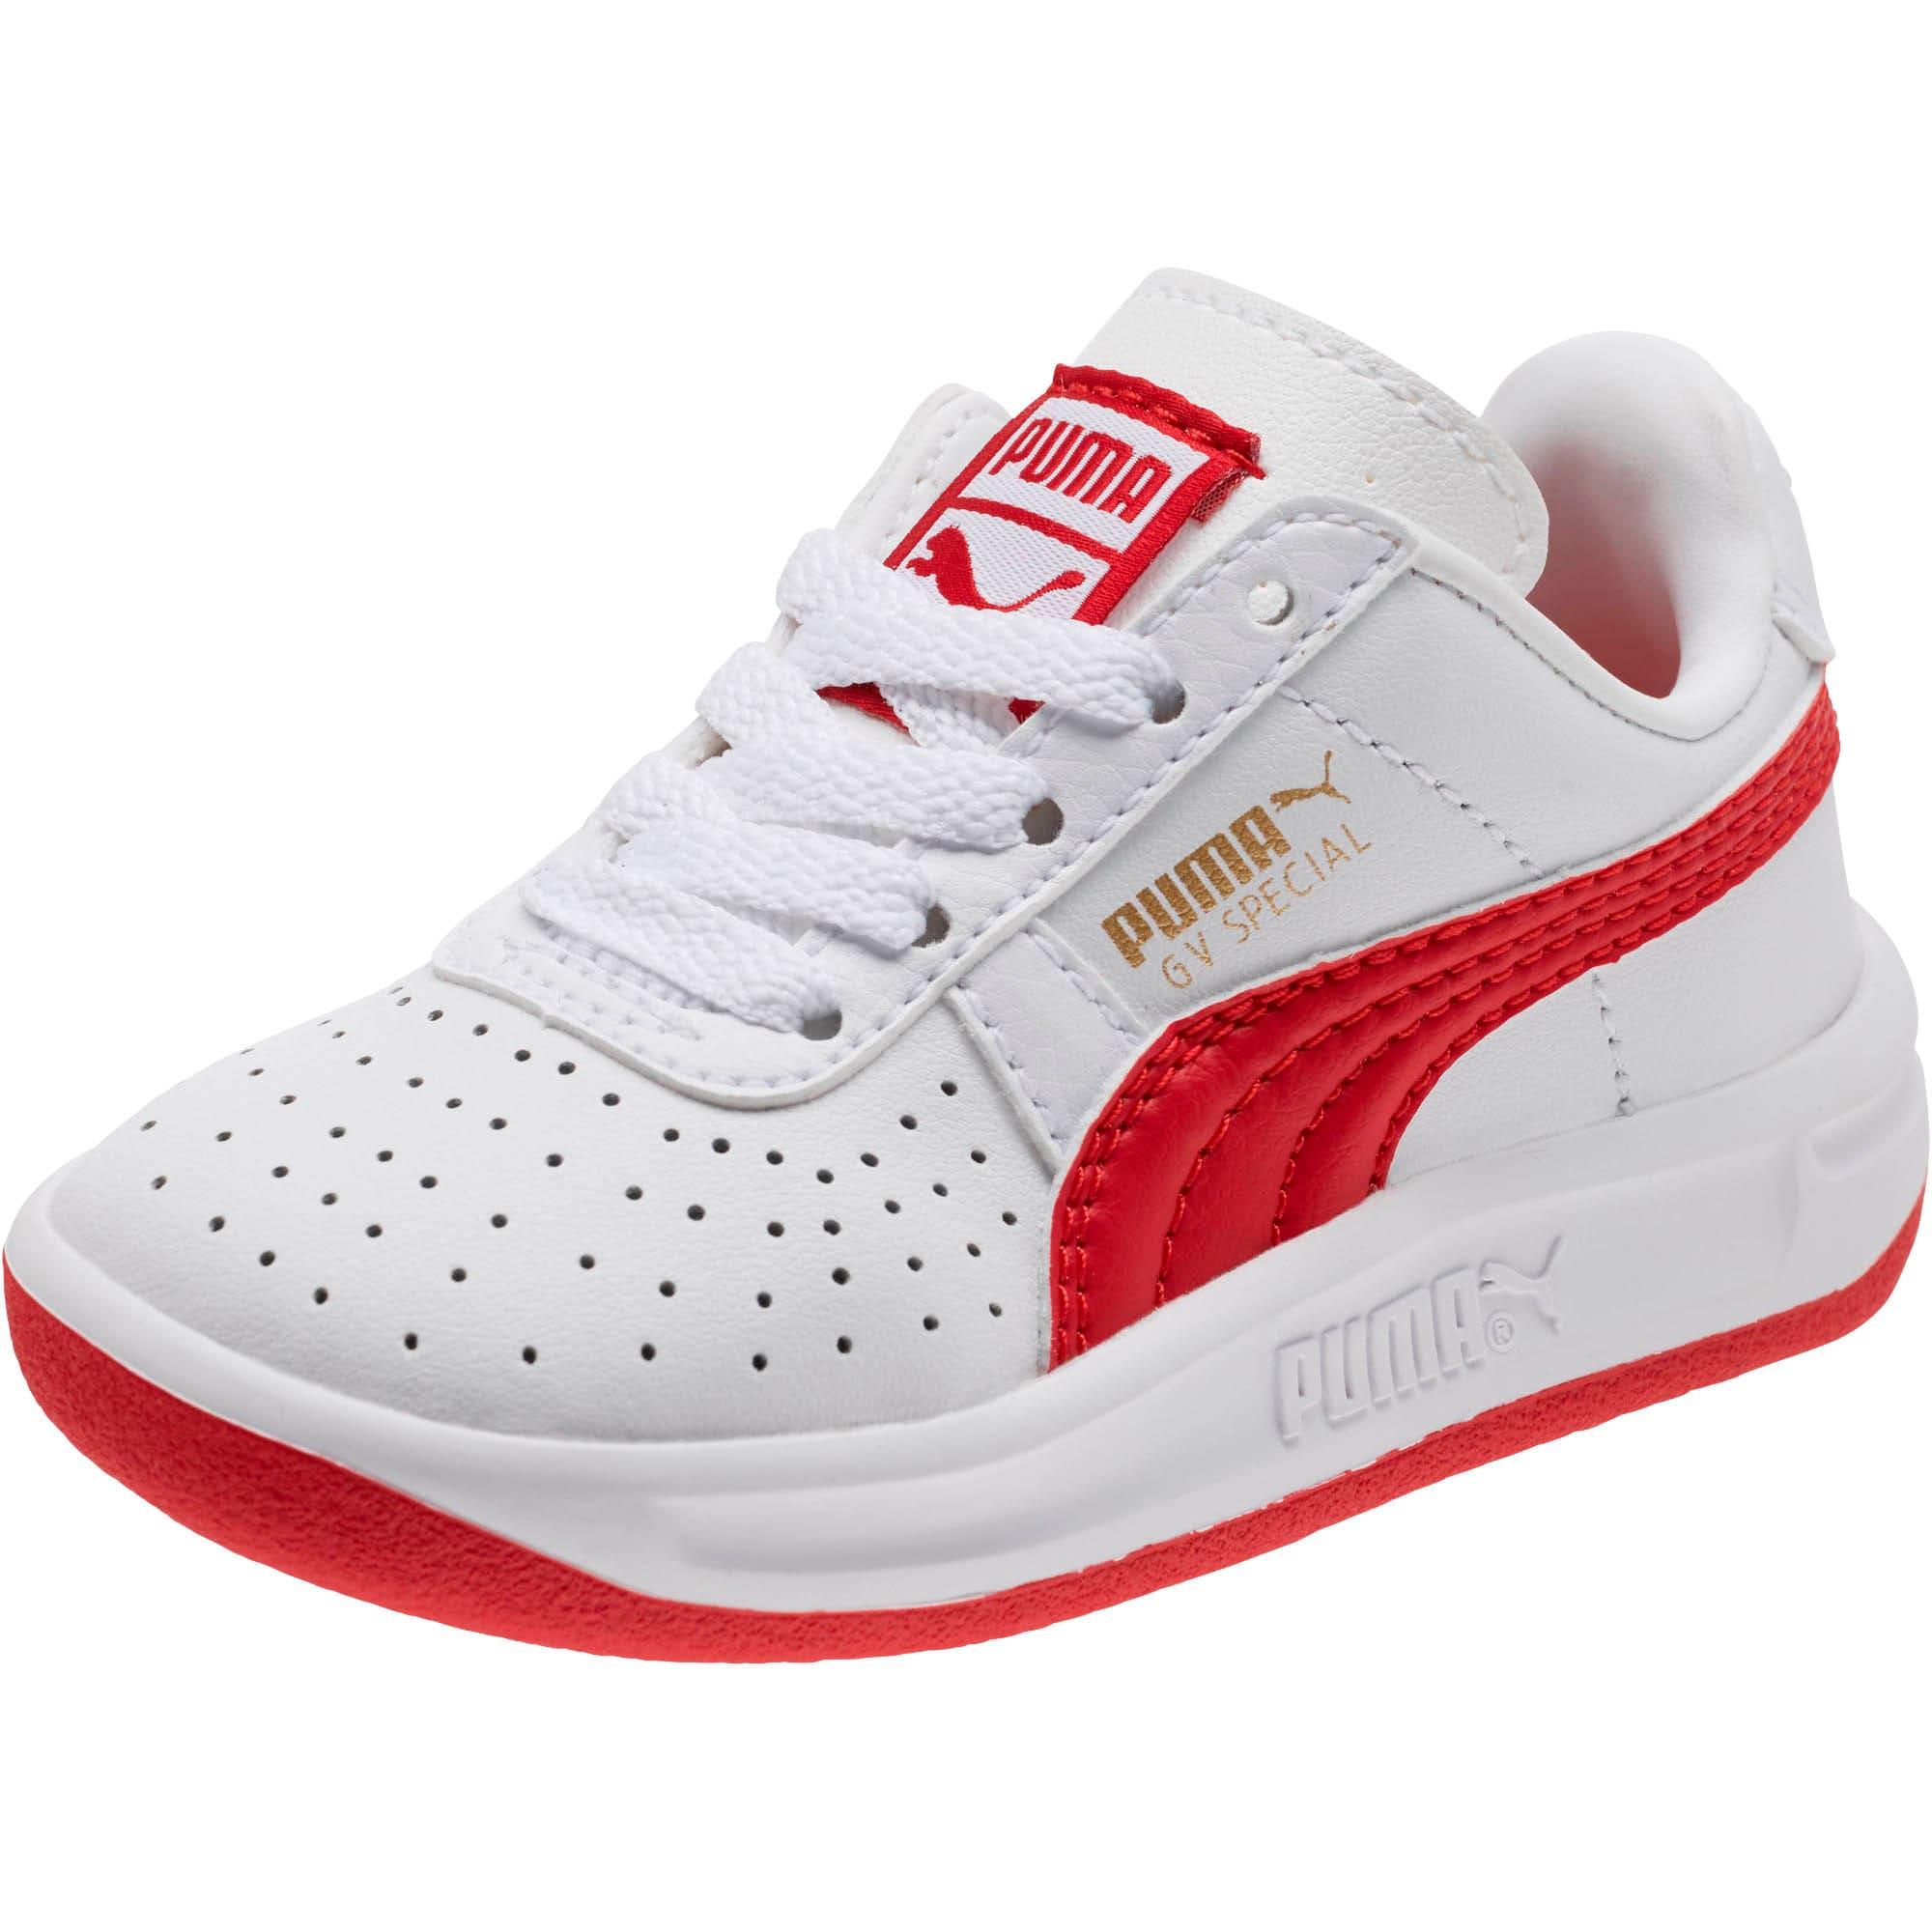 Thumbnail 1 of GV Special Toddler Shoes, Puma White-Ribbon Red, medium